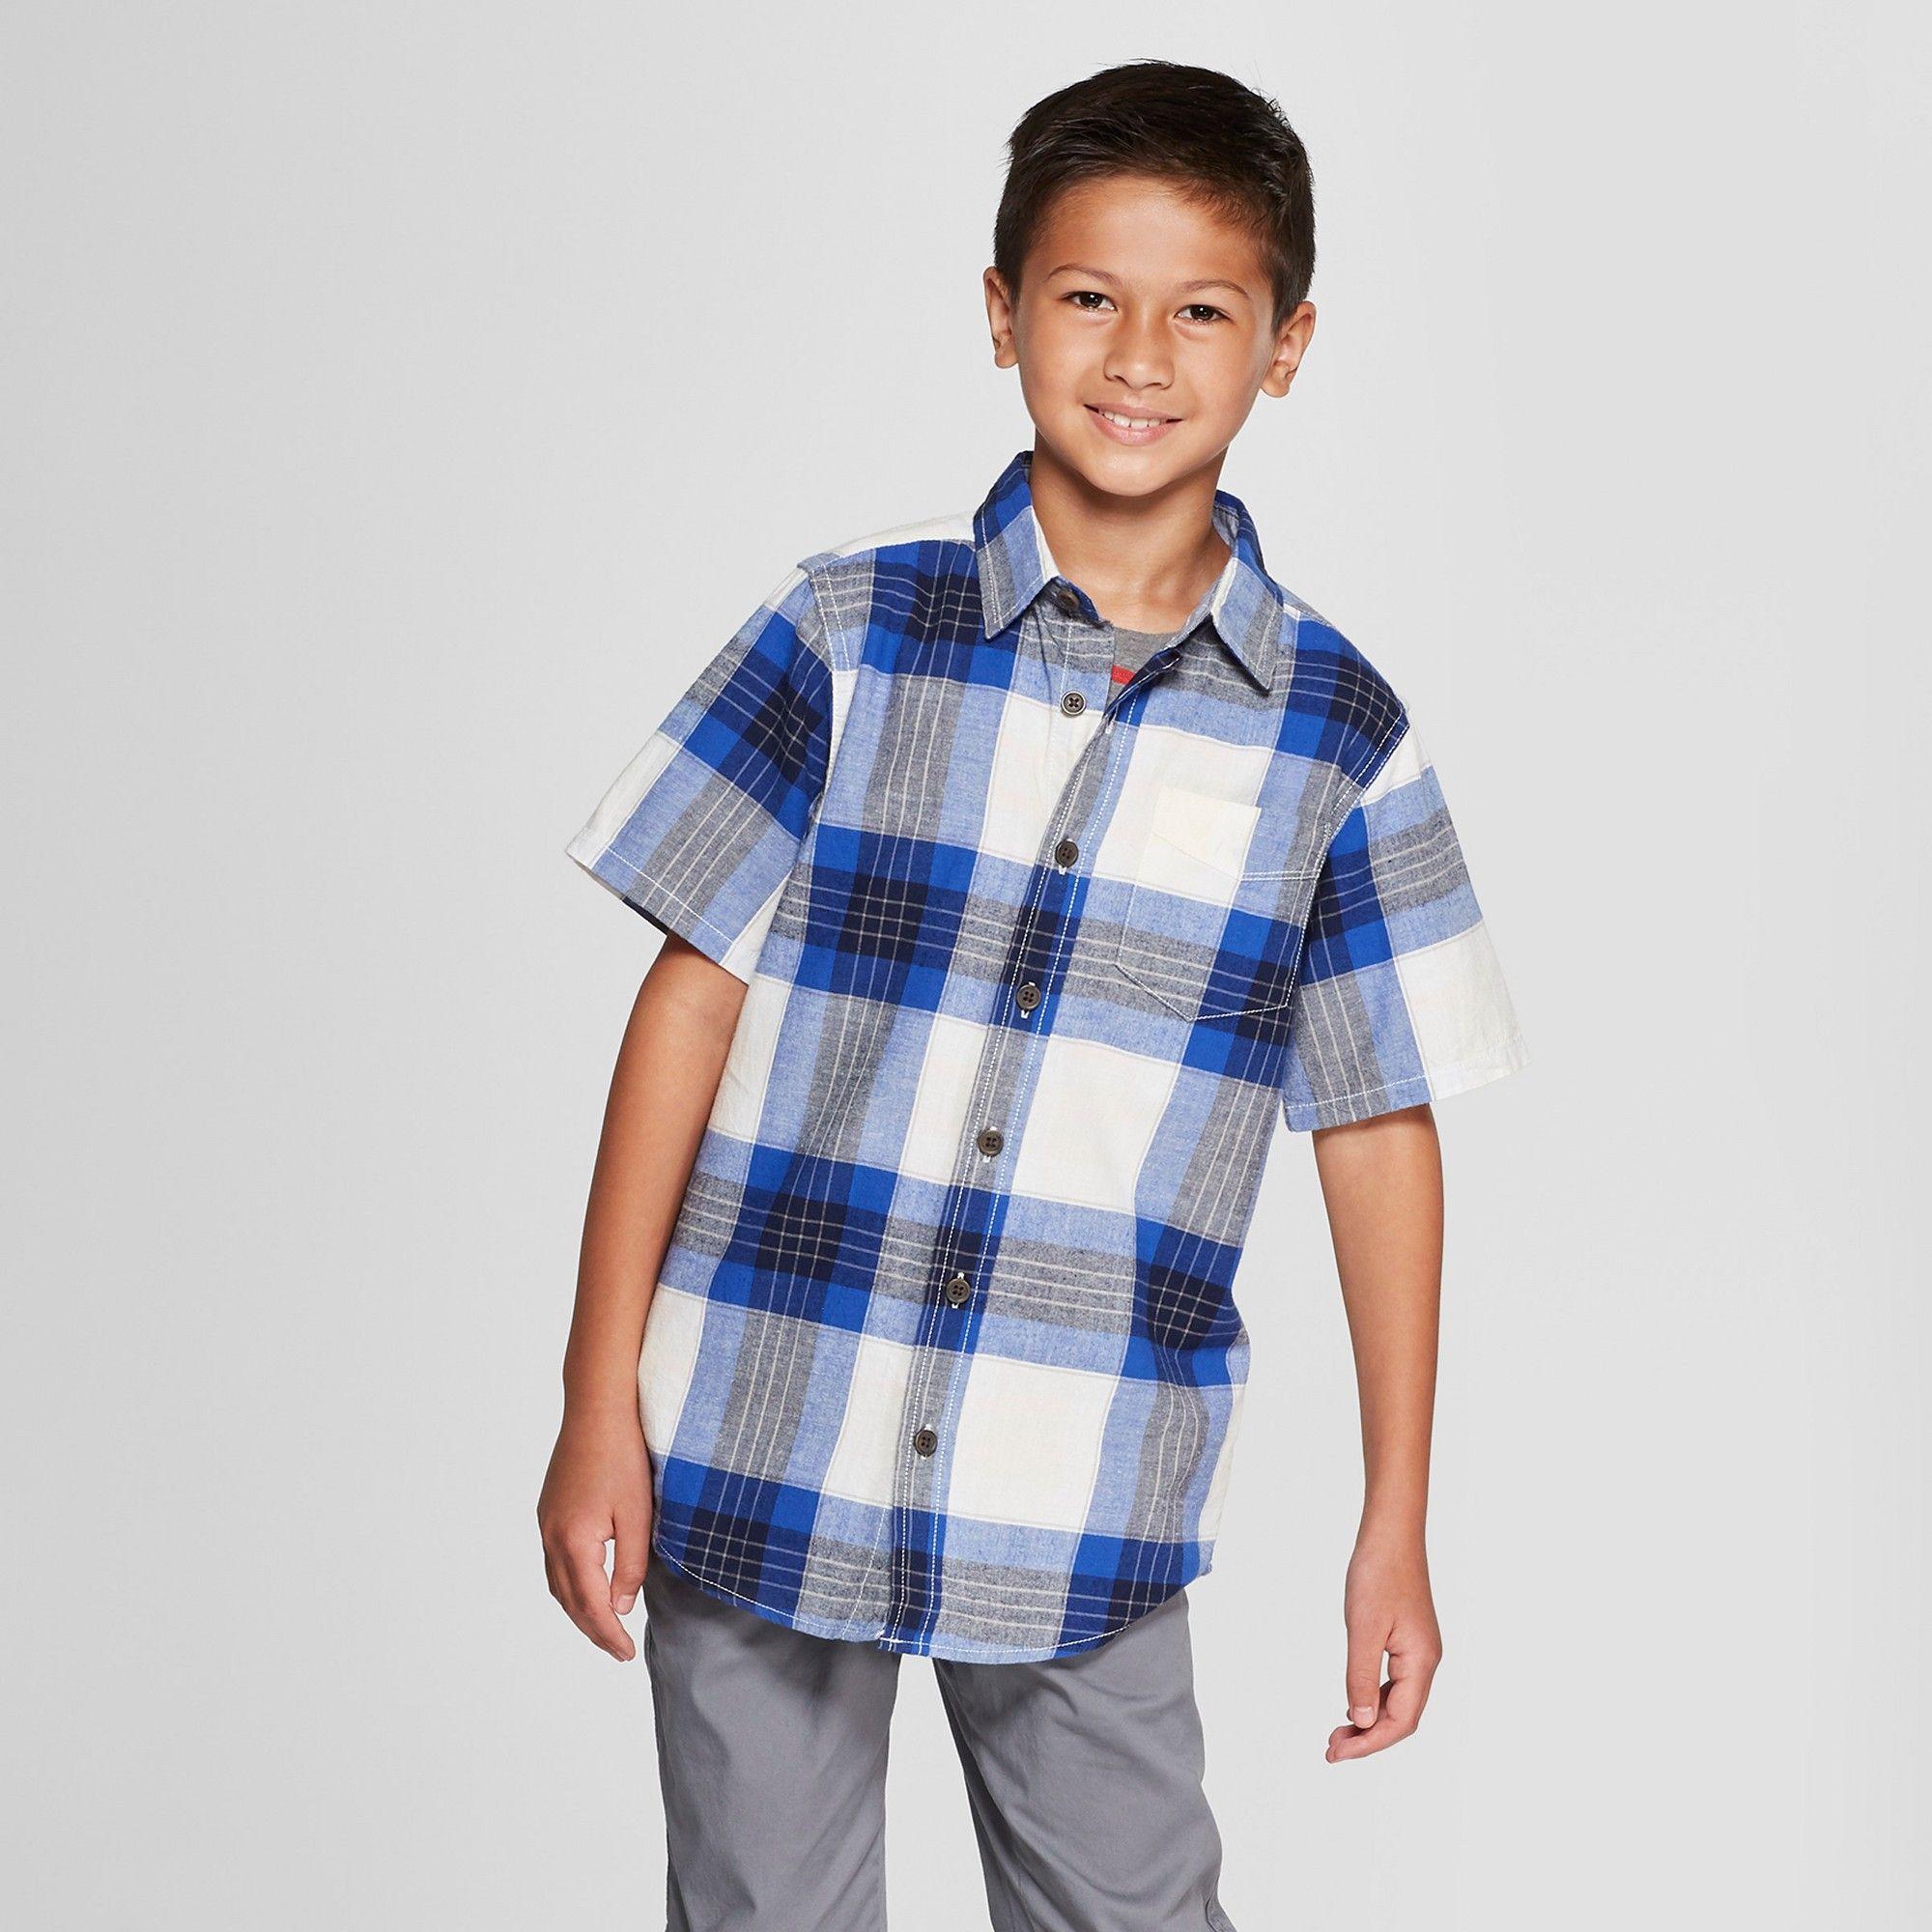 532ffa3d5 Boys' Short Sleeve Button-Down Shirt - Cat & Jack Navy Xxl, Blue ...